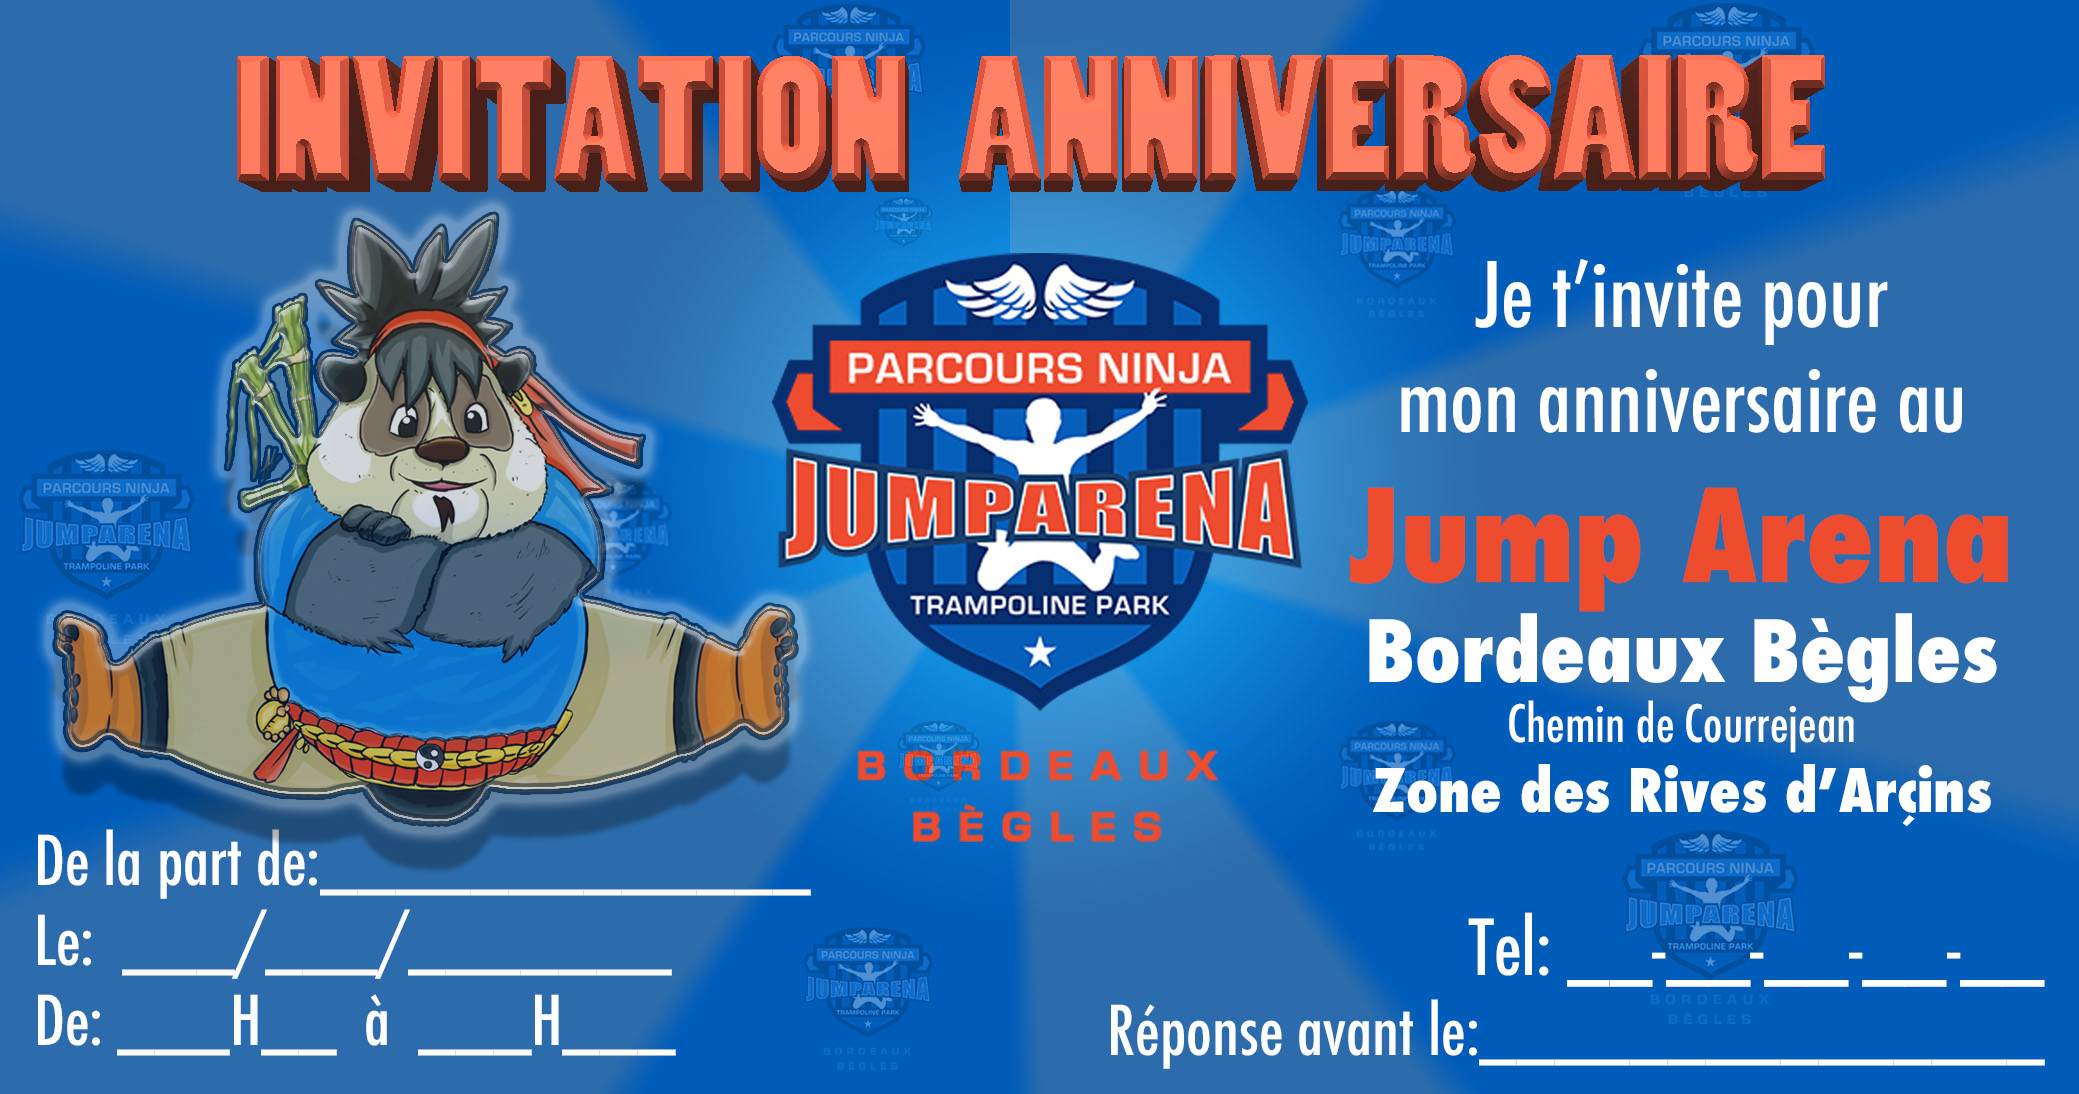 Invitation anniversaire jump arena bordeaux